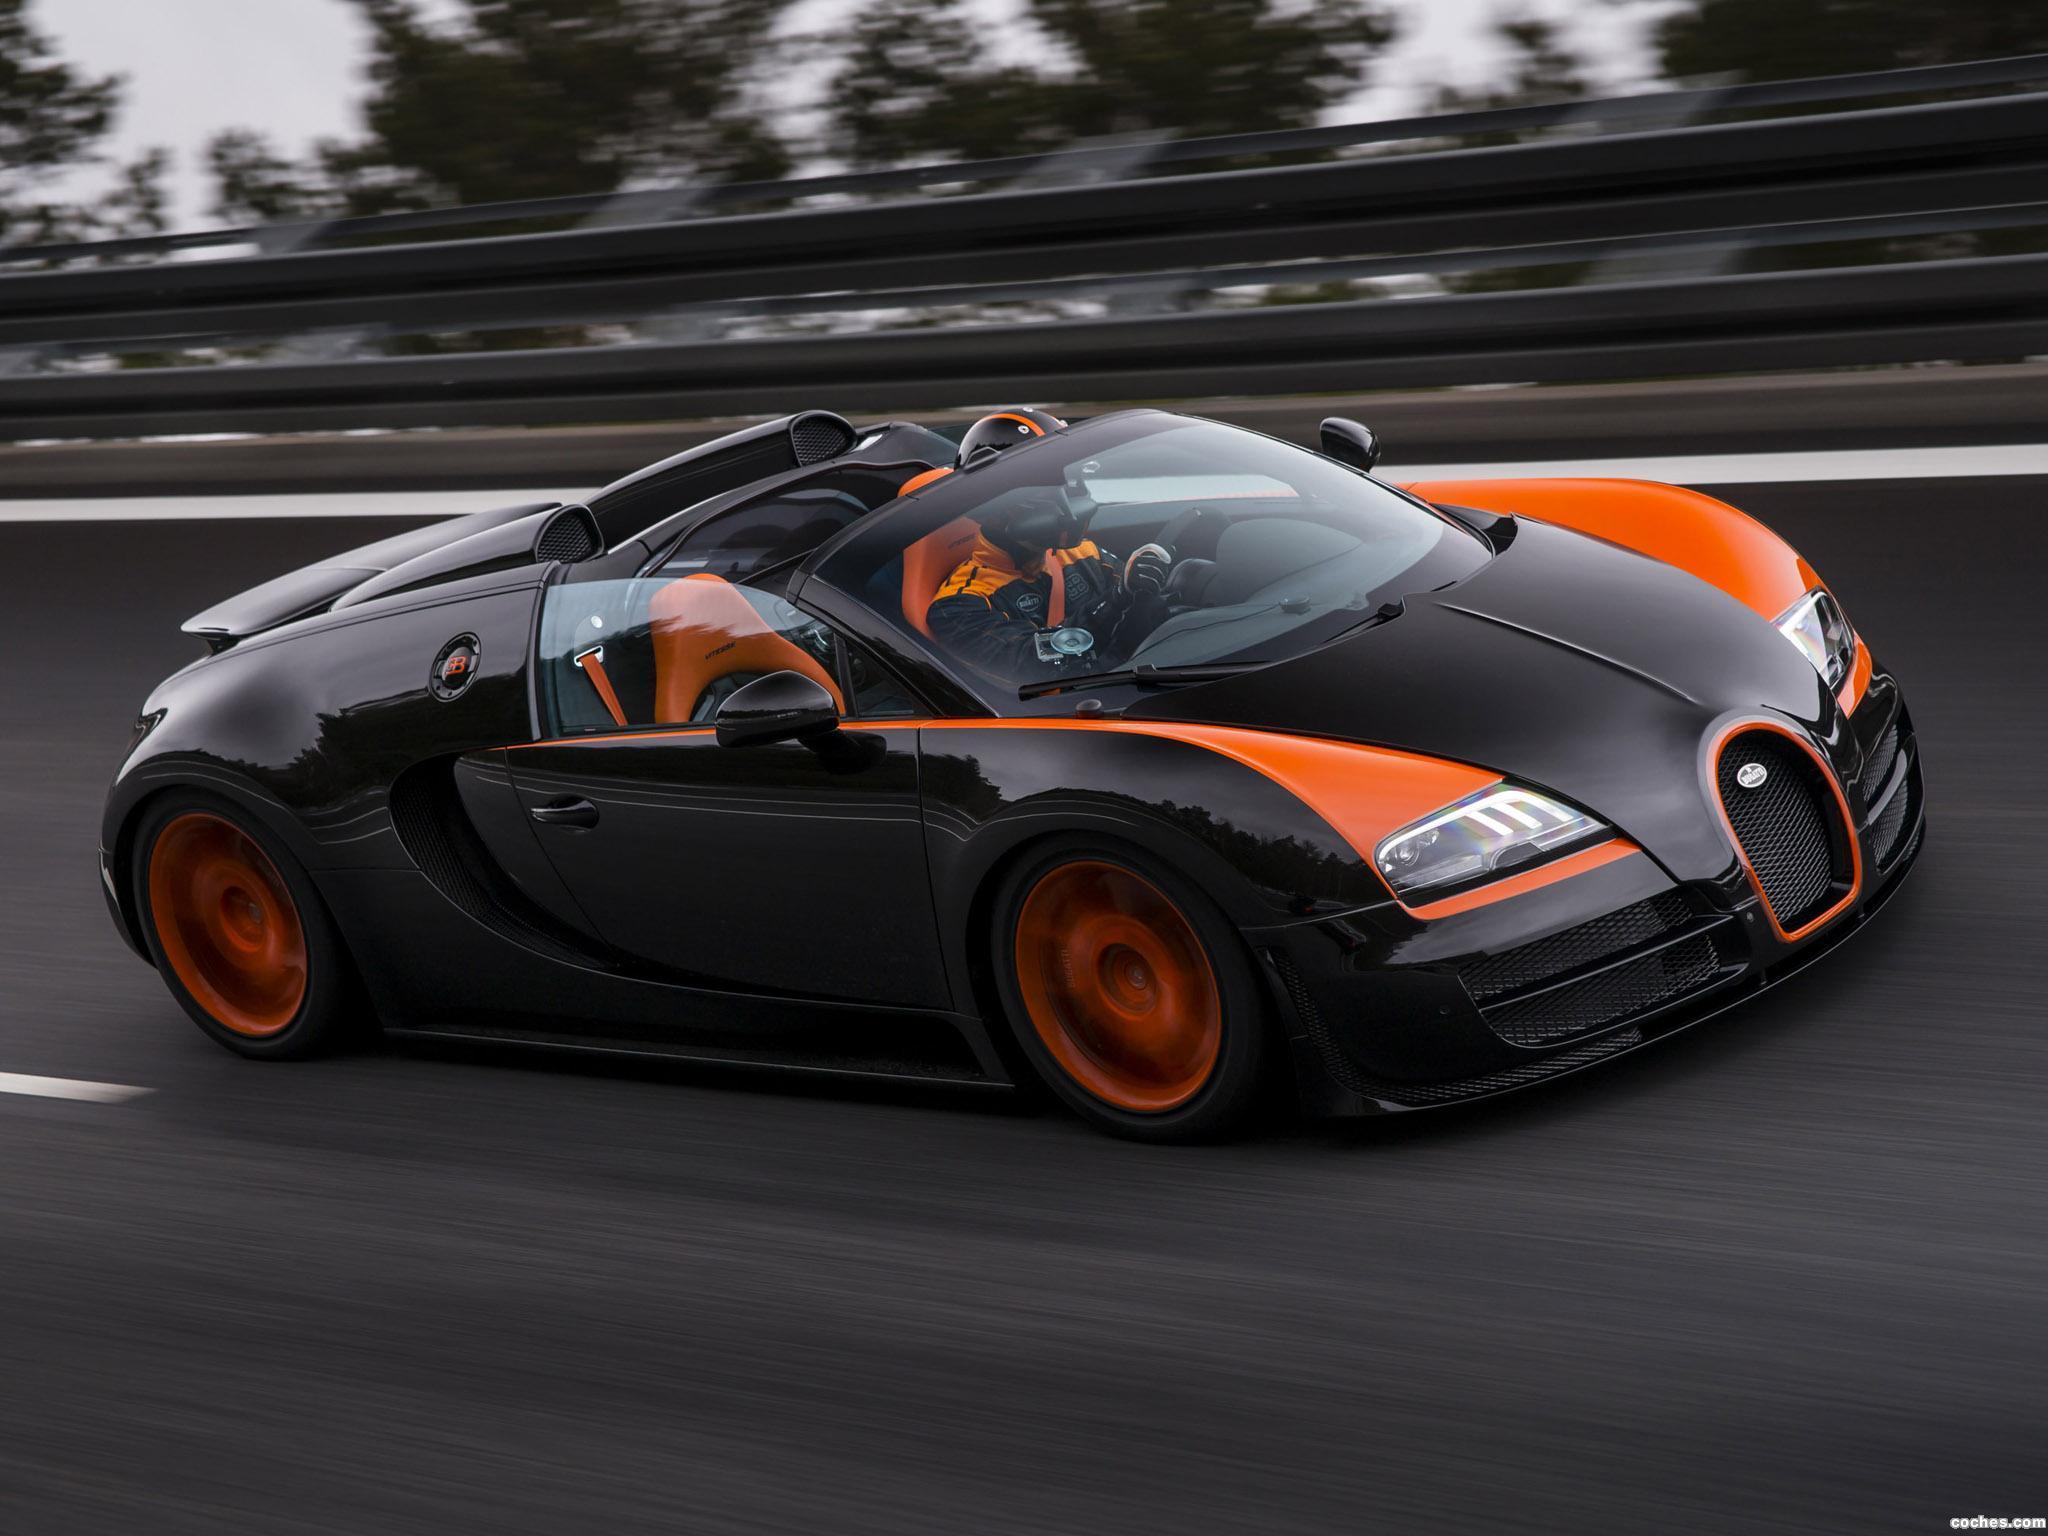 bugatti_veyron-grand-sport-vitesse-world-record-car-2013_r14 Remarkable Bugatti Veyron Grand Sport Vitesse Informacion Cars Trend